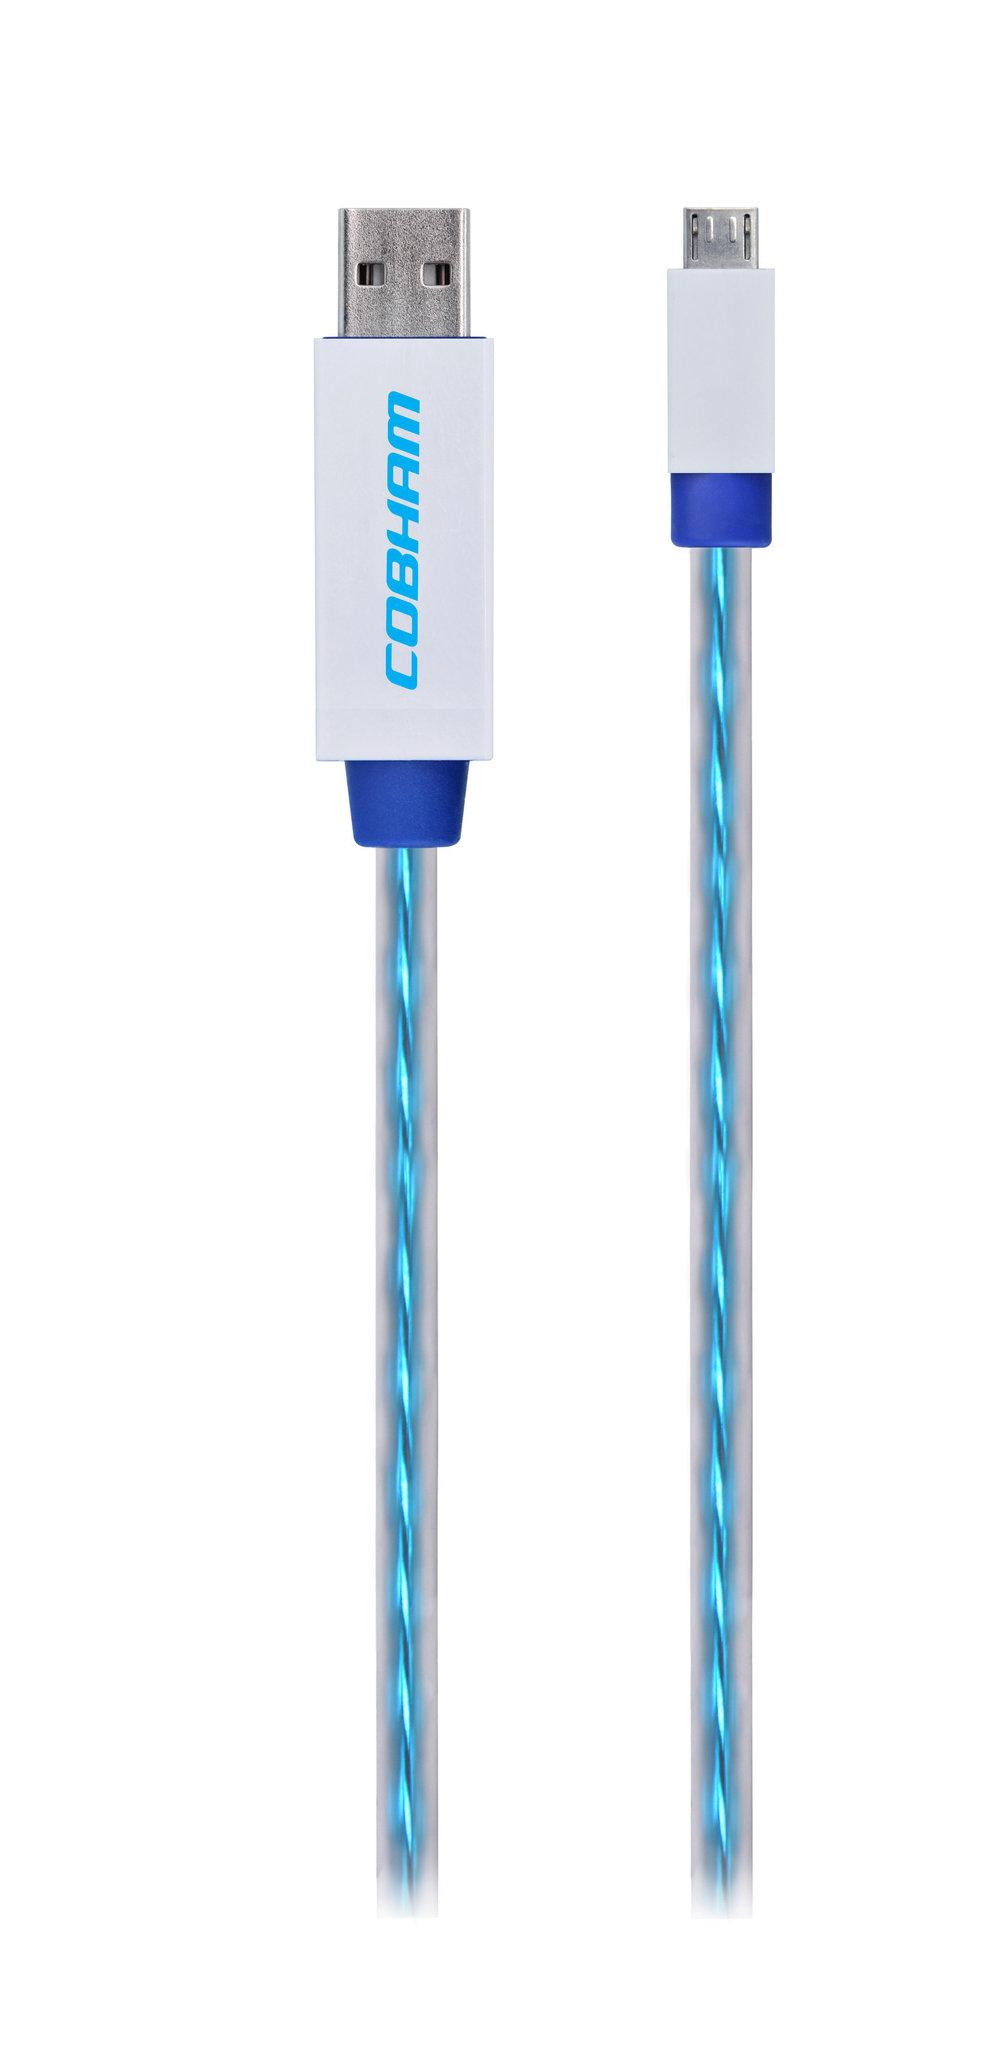 Cobeham White USB Light up Cables.jpg